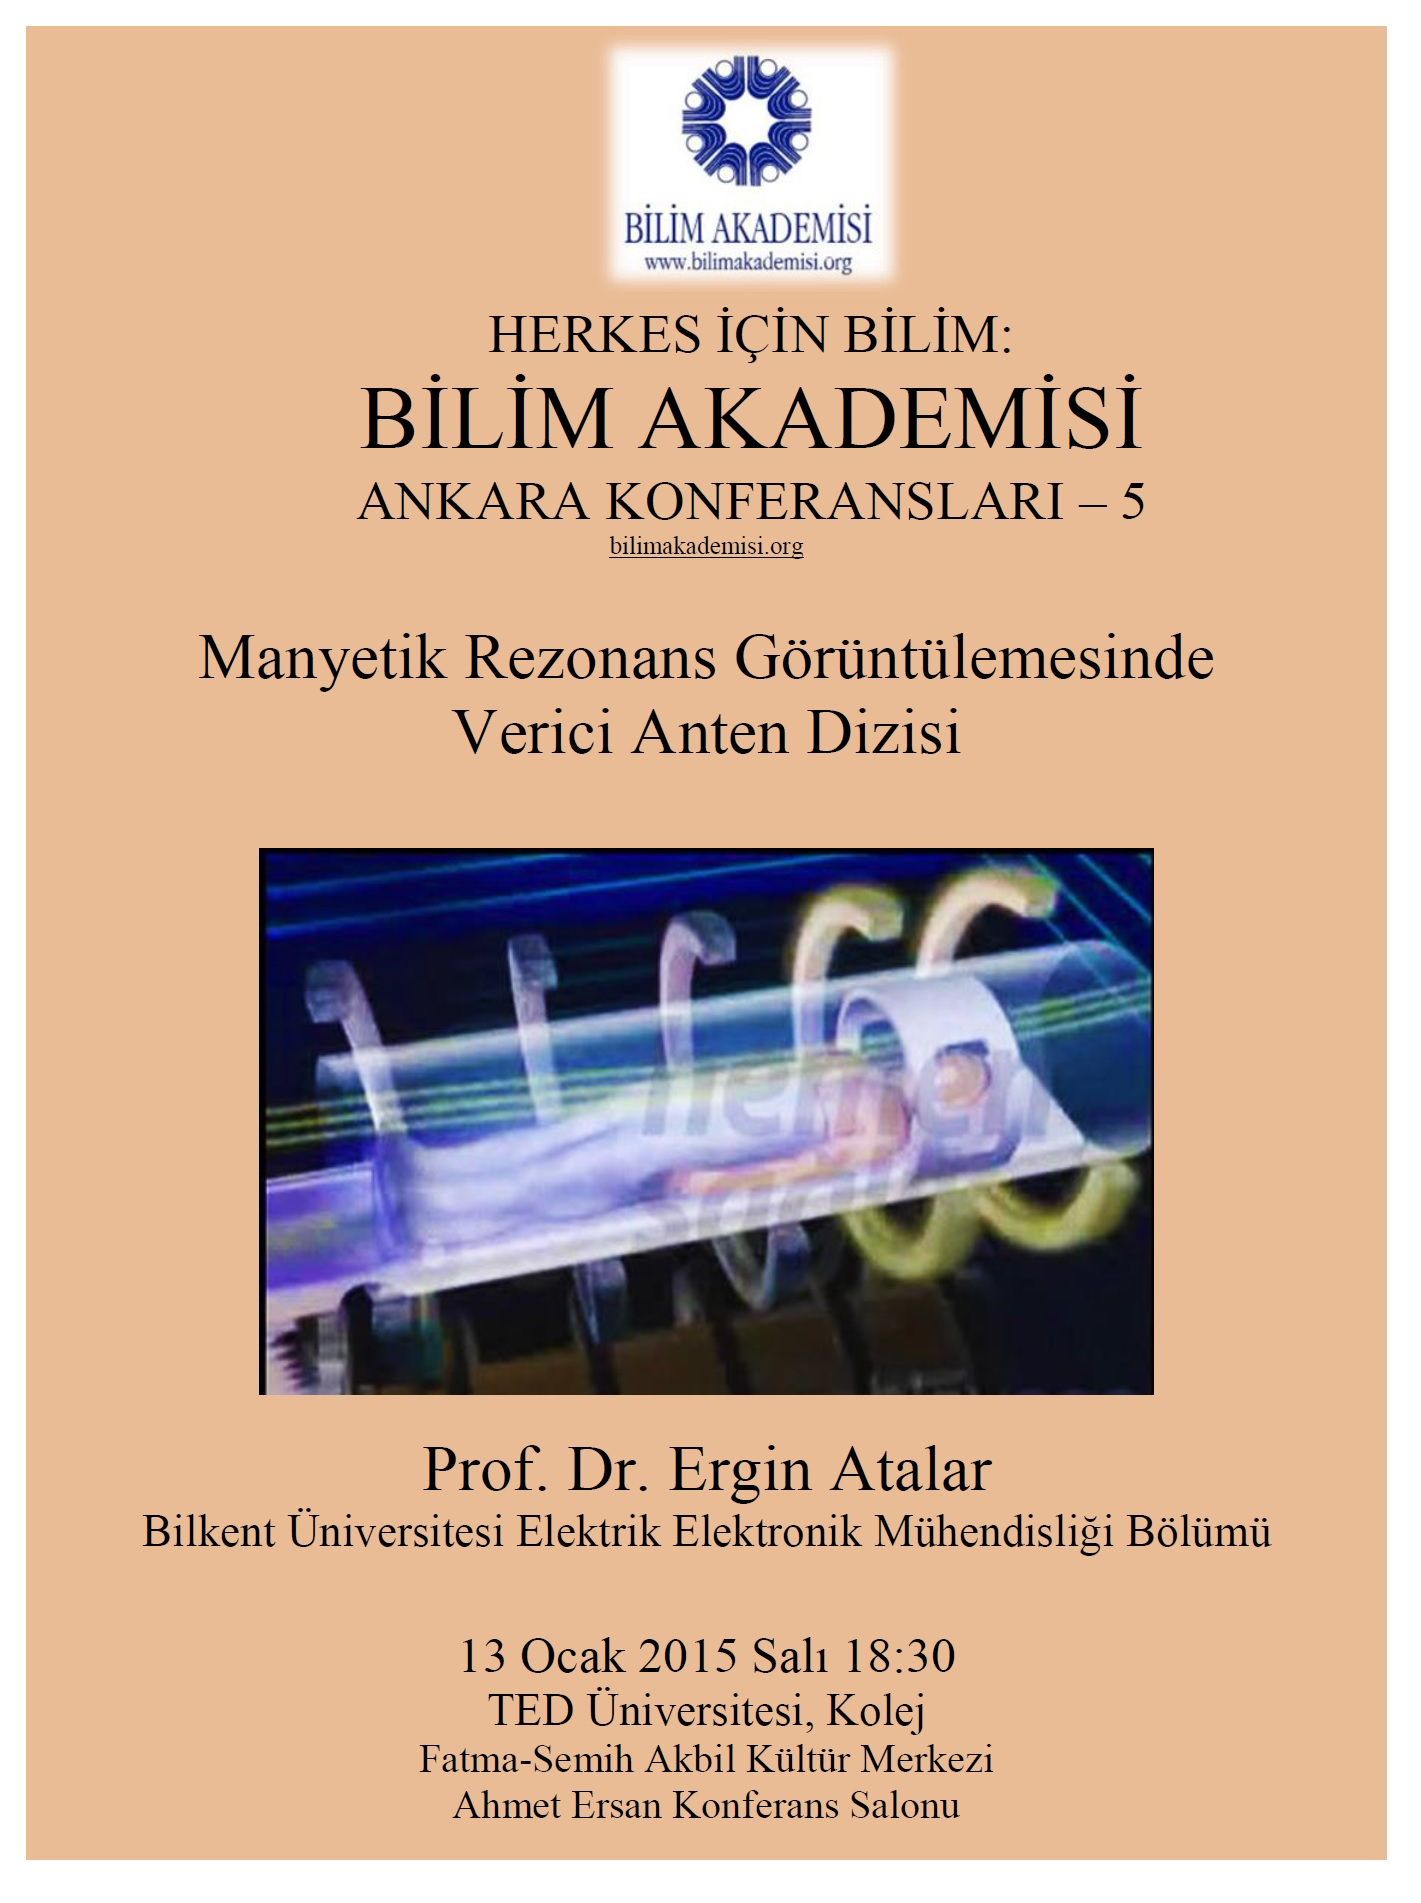 Magnetic Resonance Imaging and Transmission Antennas – Speaker: Ergin Atalar